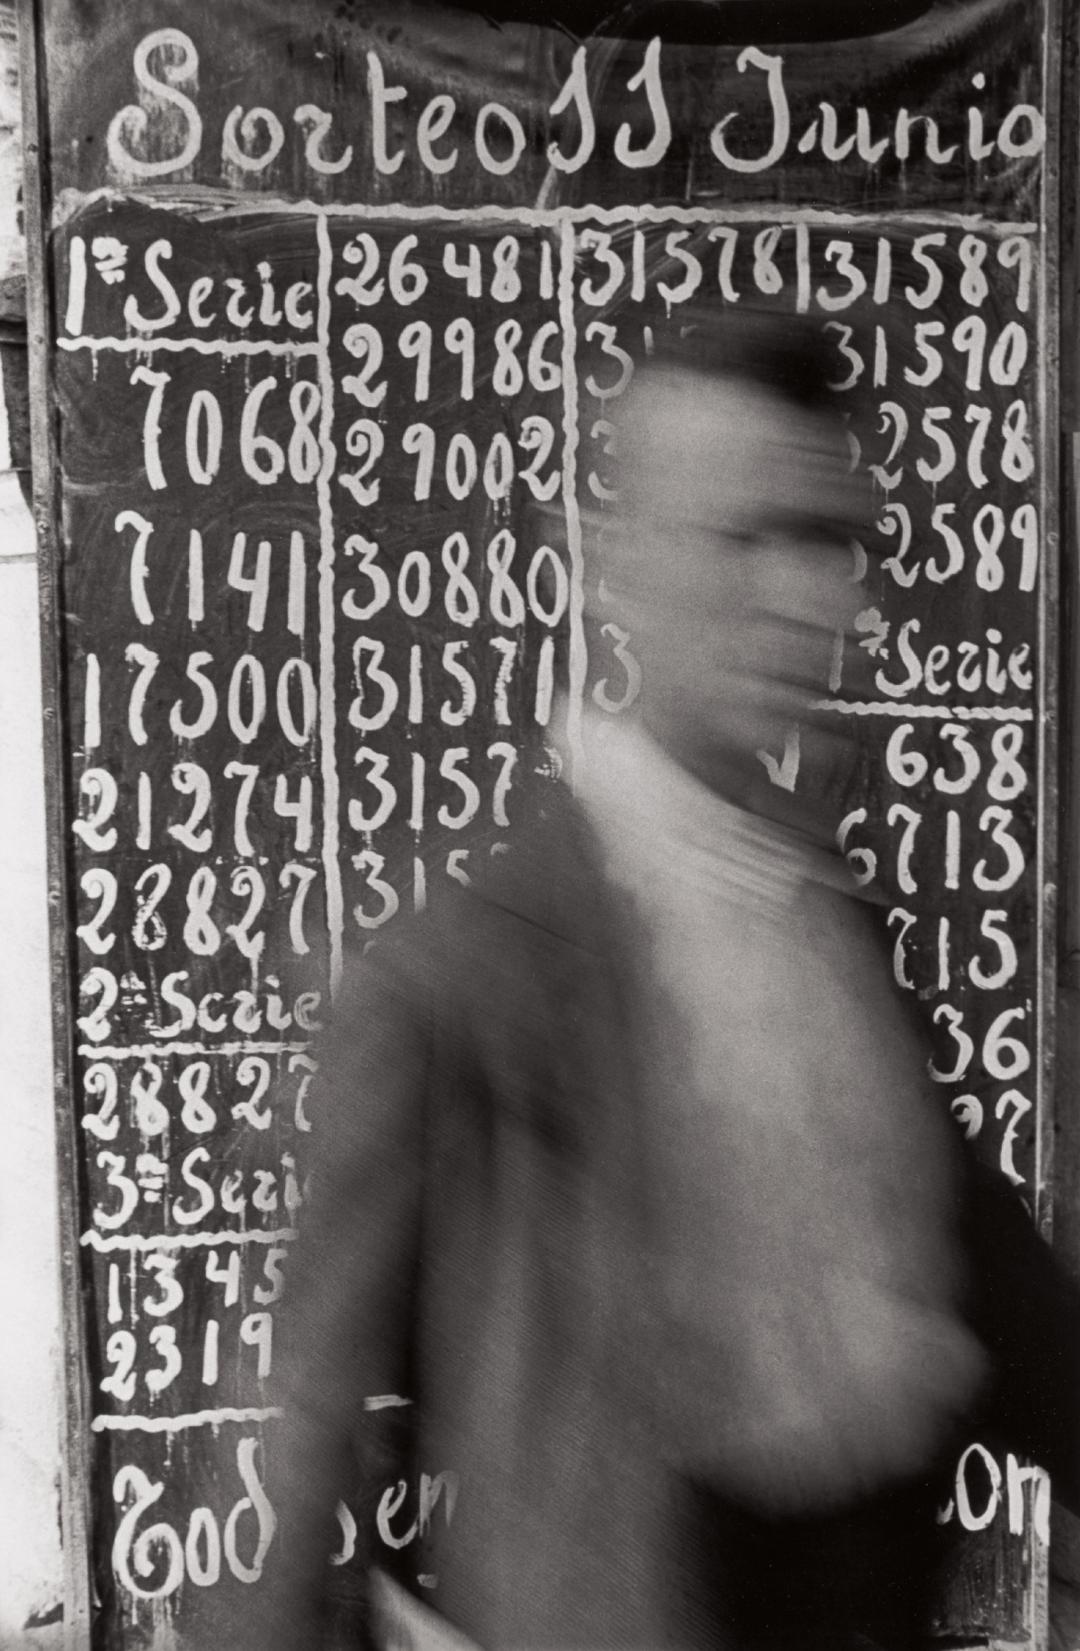 Henri Cartier-Bresson-La Suerte De Hoy (Todays Luck), Madrid-1933